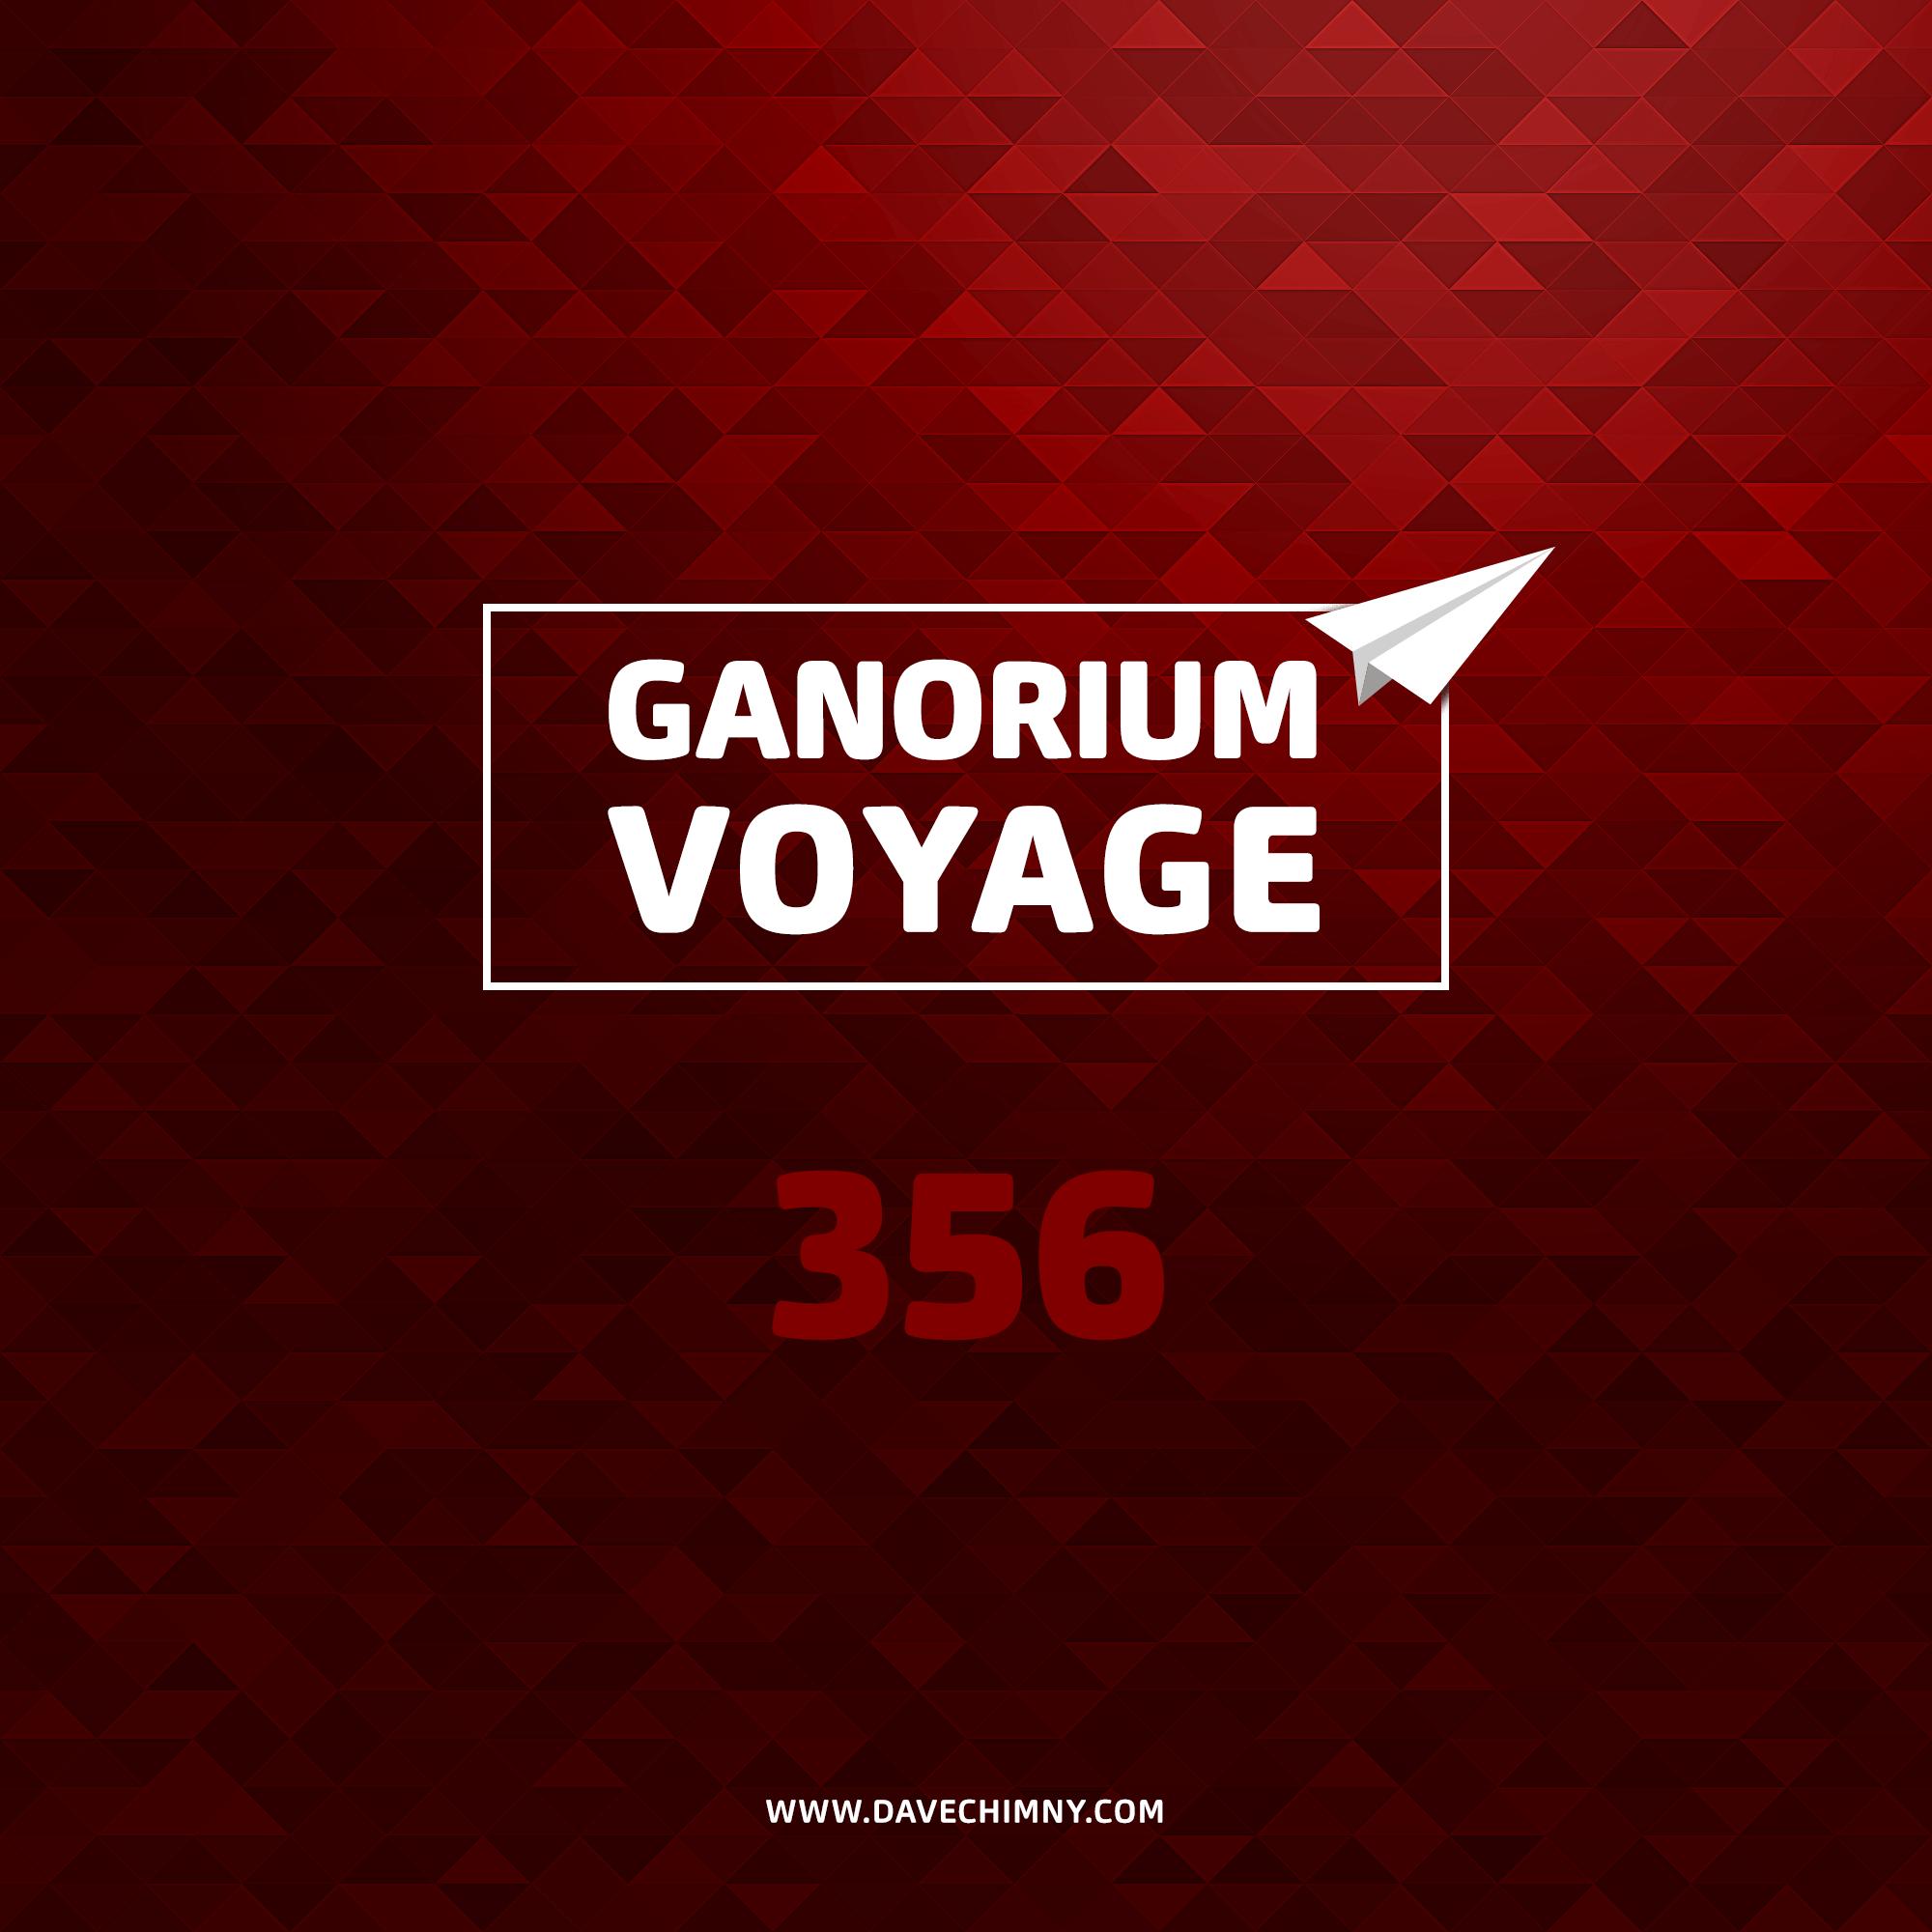 Dave Chimny – Ganorium Voyage 356